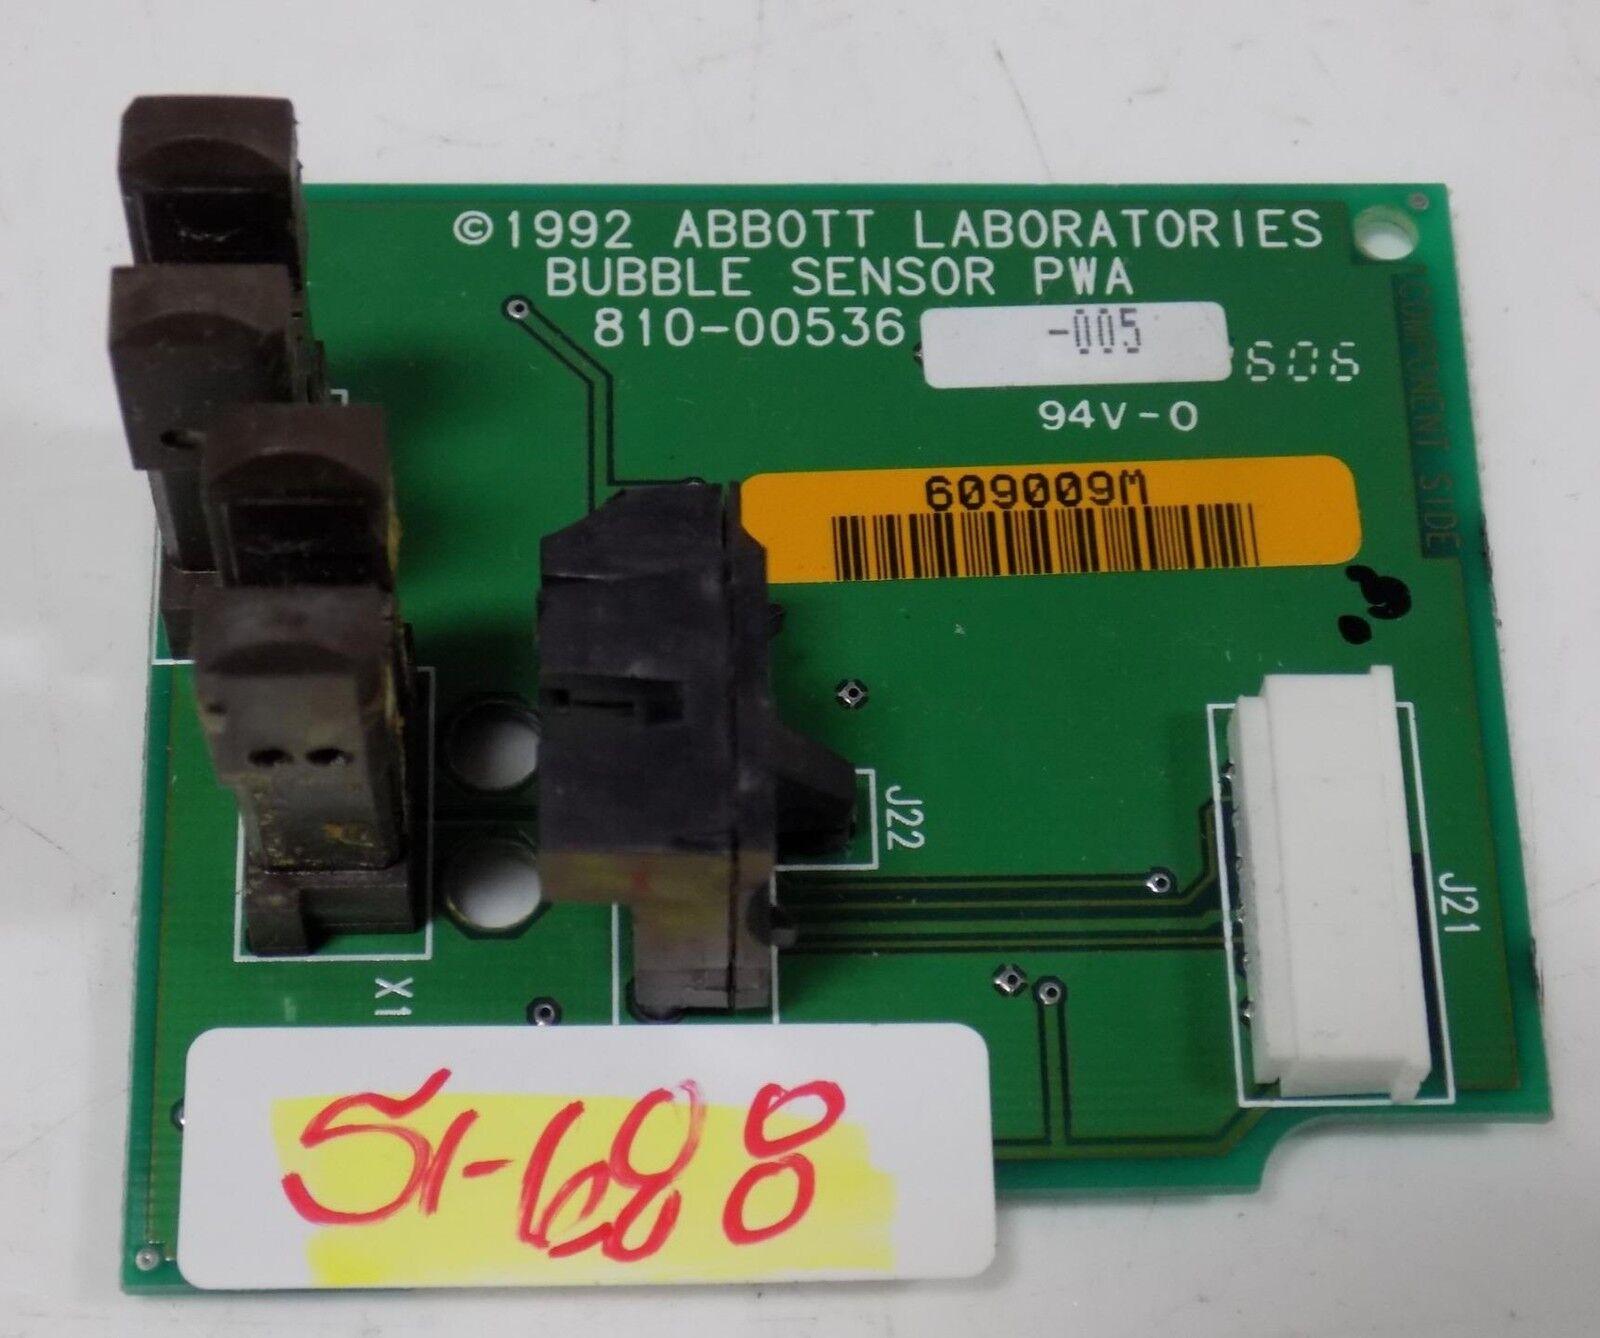 ABBOTT BUBBLE SENSOR PWA CIRCUIT BOARD 810-00536-005